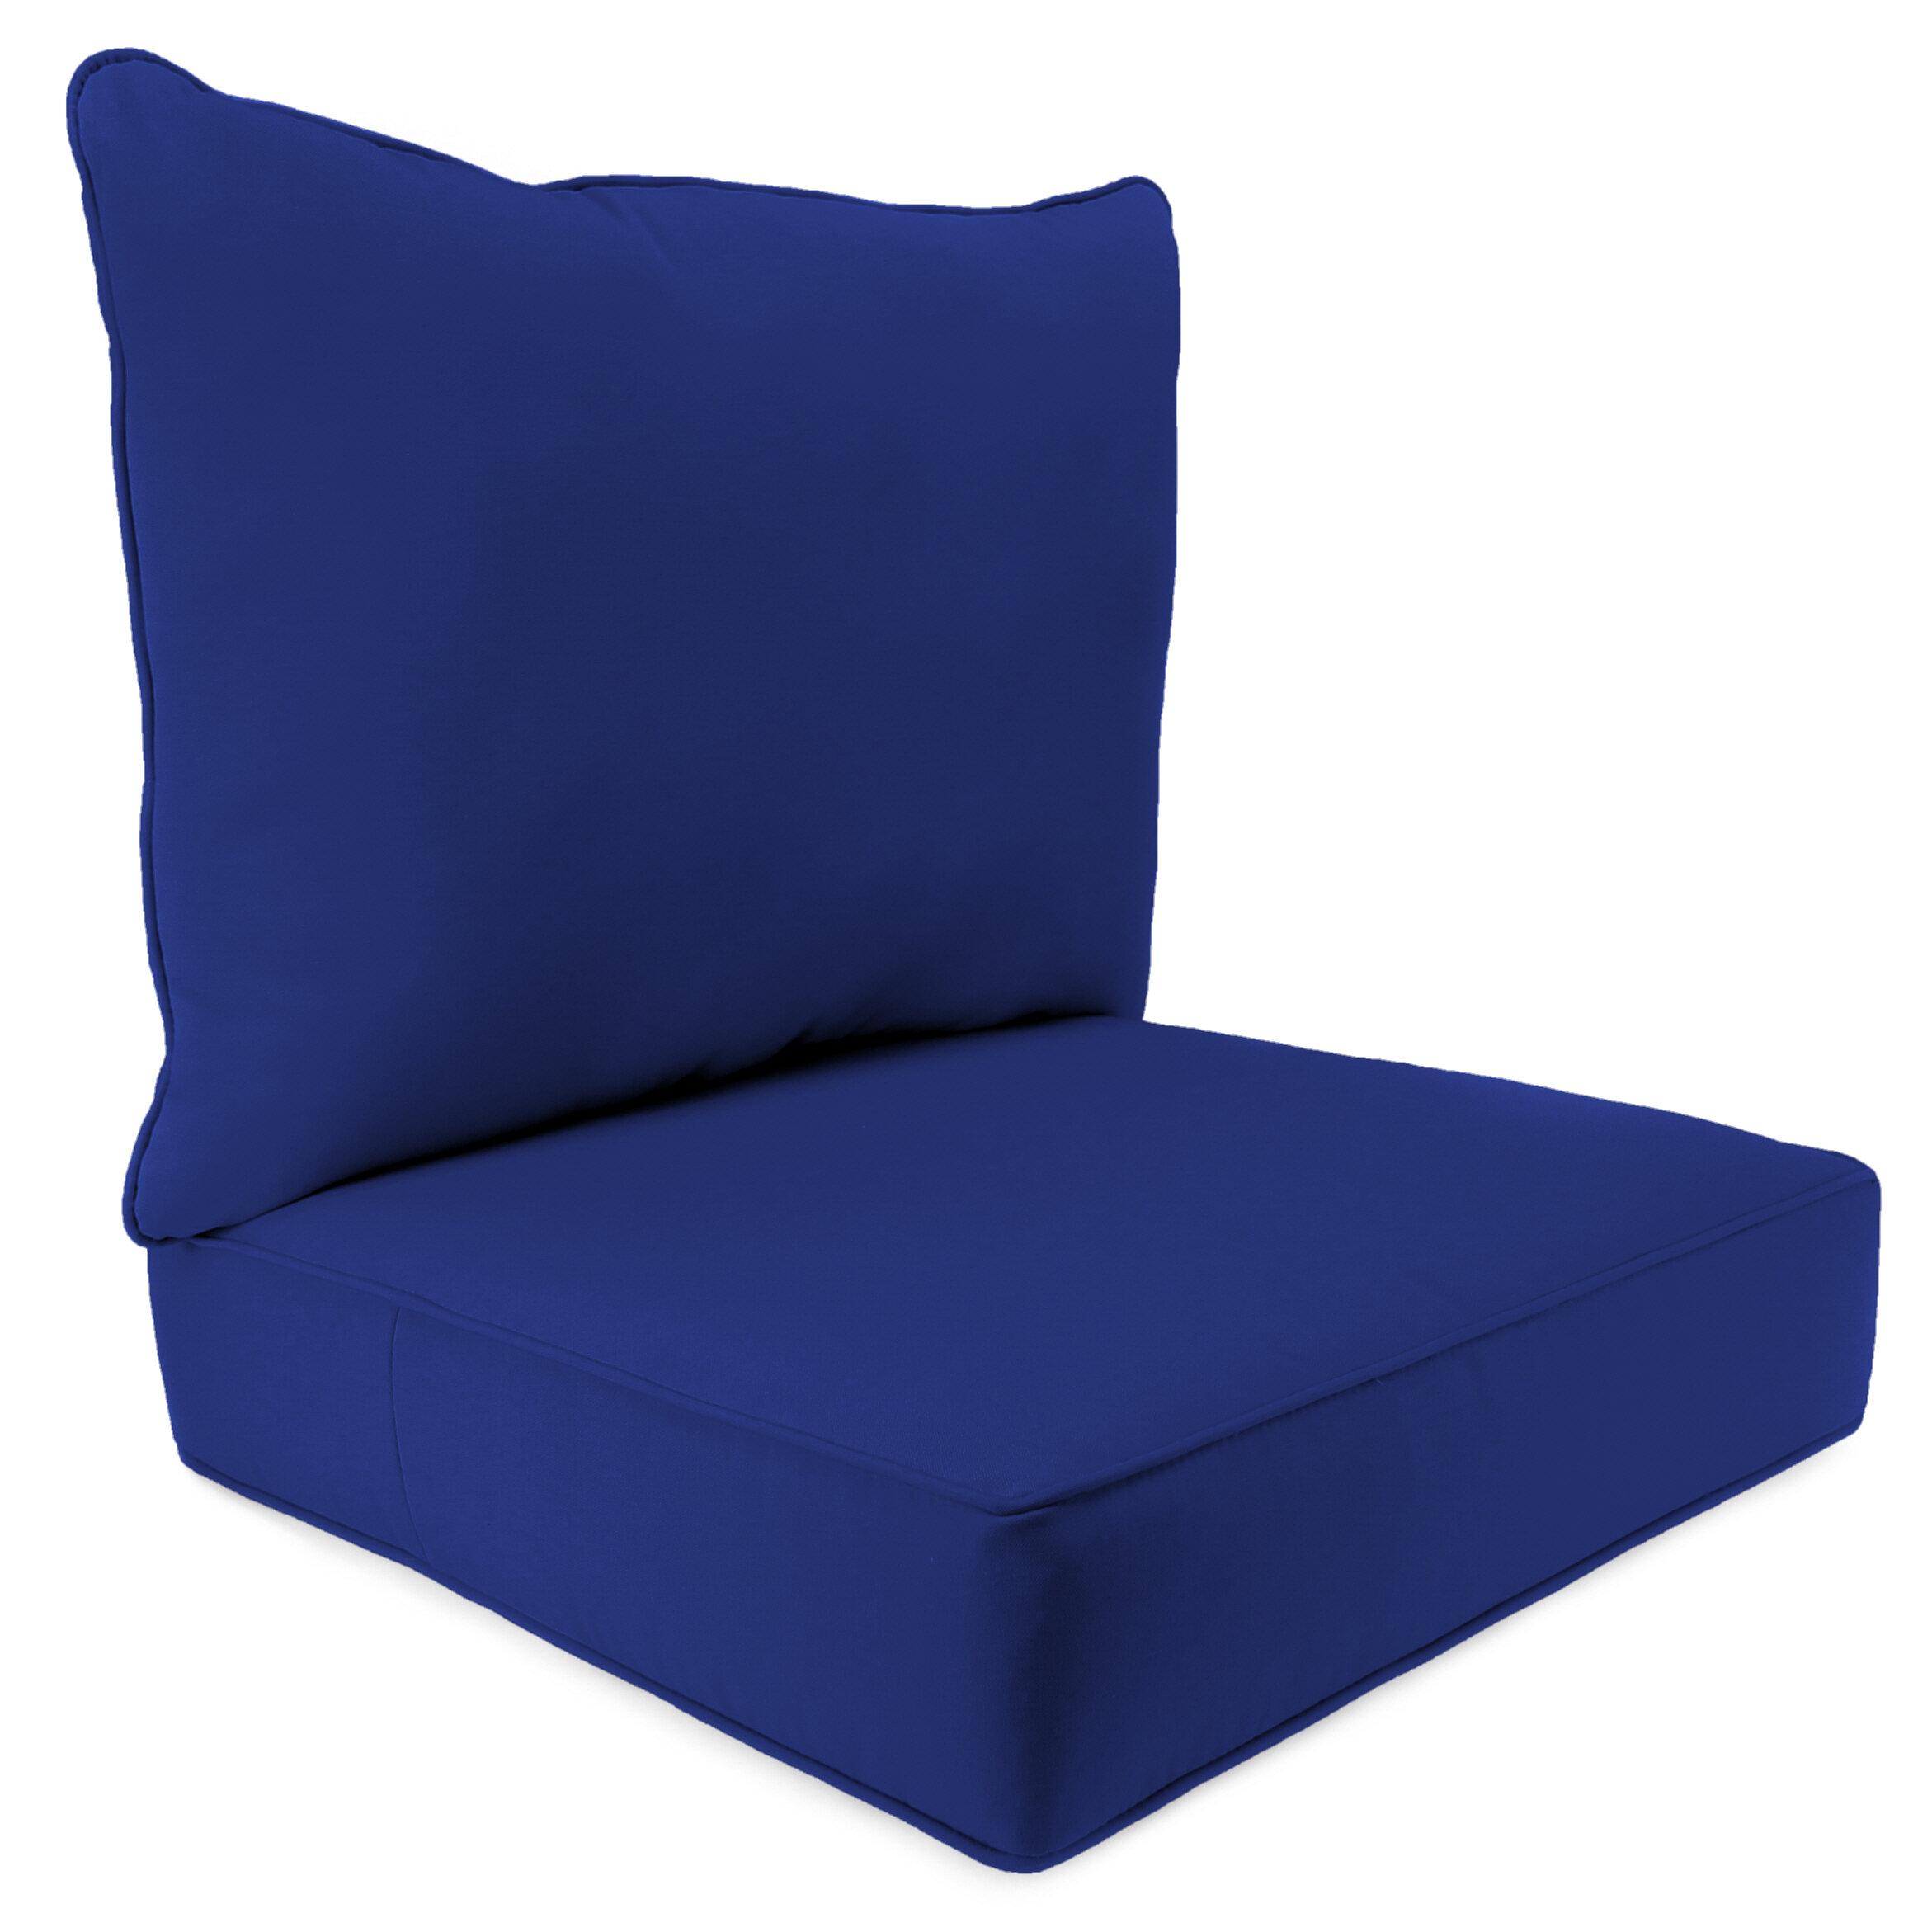 Stupendous 2 Piece Indoor Outdoor Chair Cushion Set Download Free Architecture Designs Sospemadebymaigaardcom